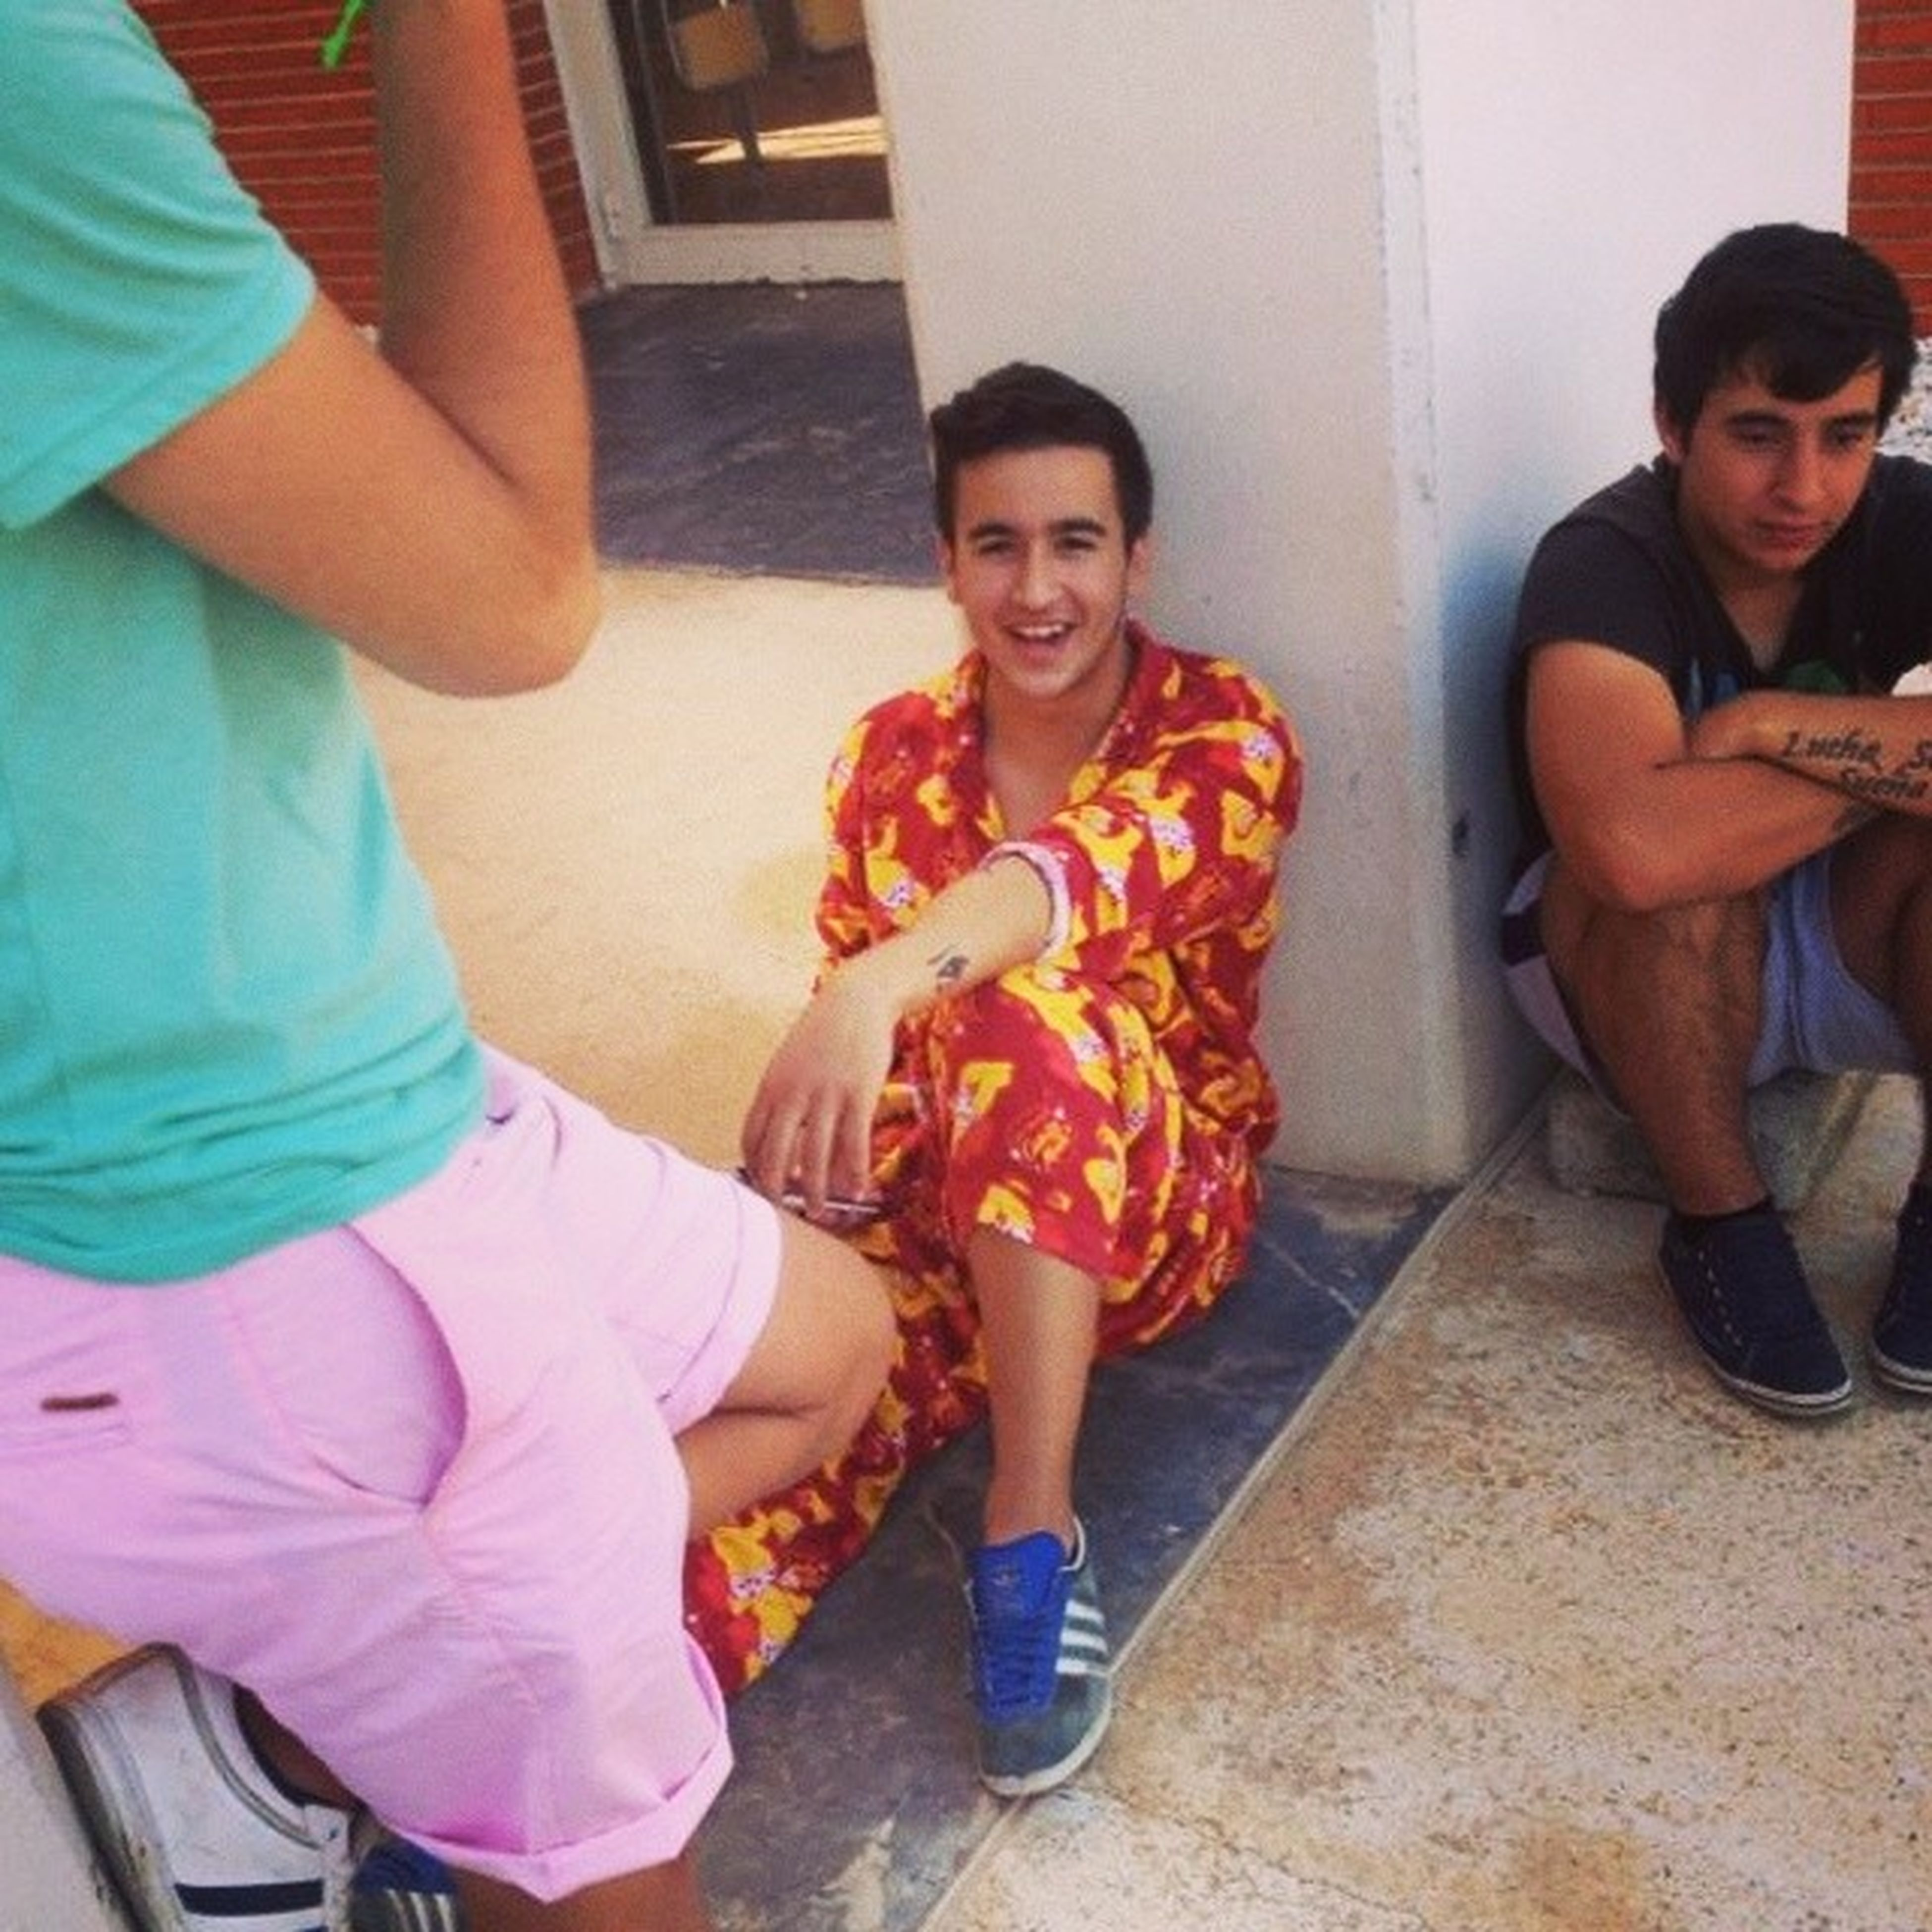 Ultimo dia de instituto y en pijama Veranitoooooo Pijama